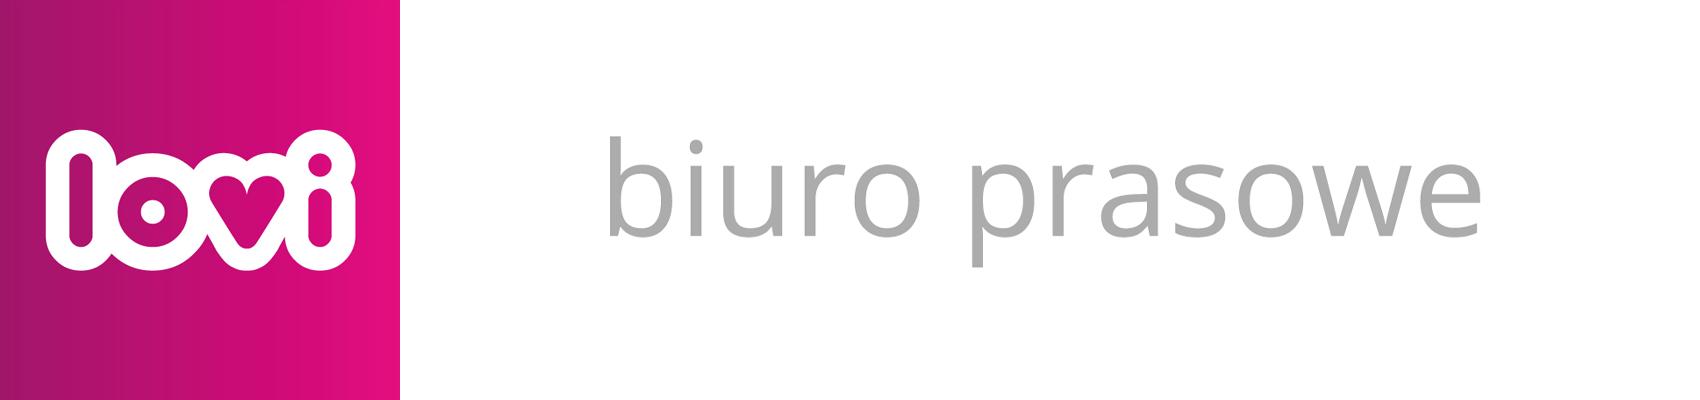 Biuro prasowe Lovi logo